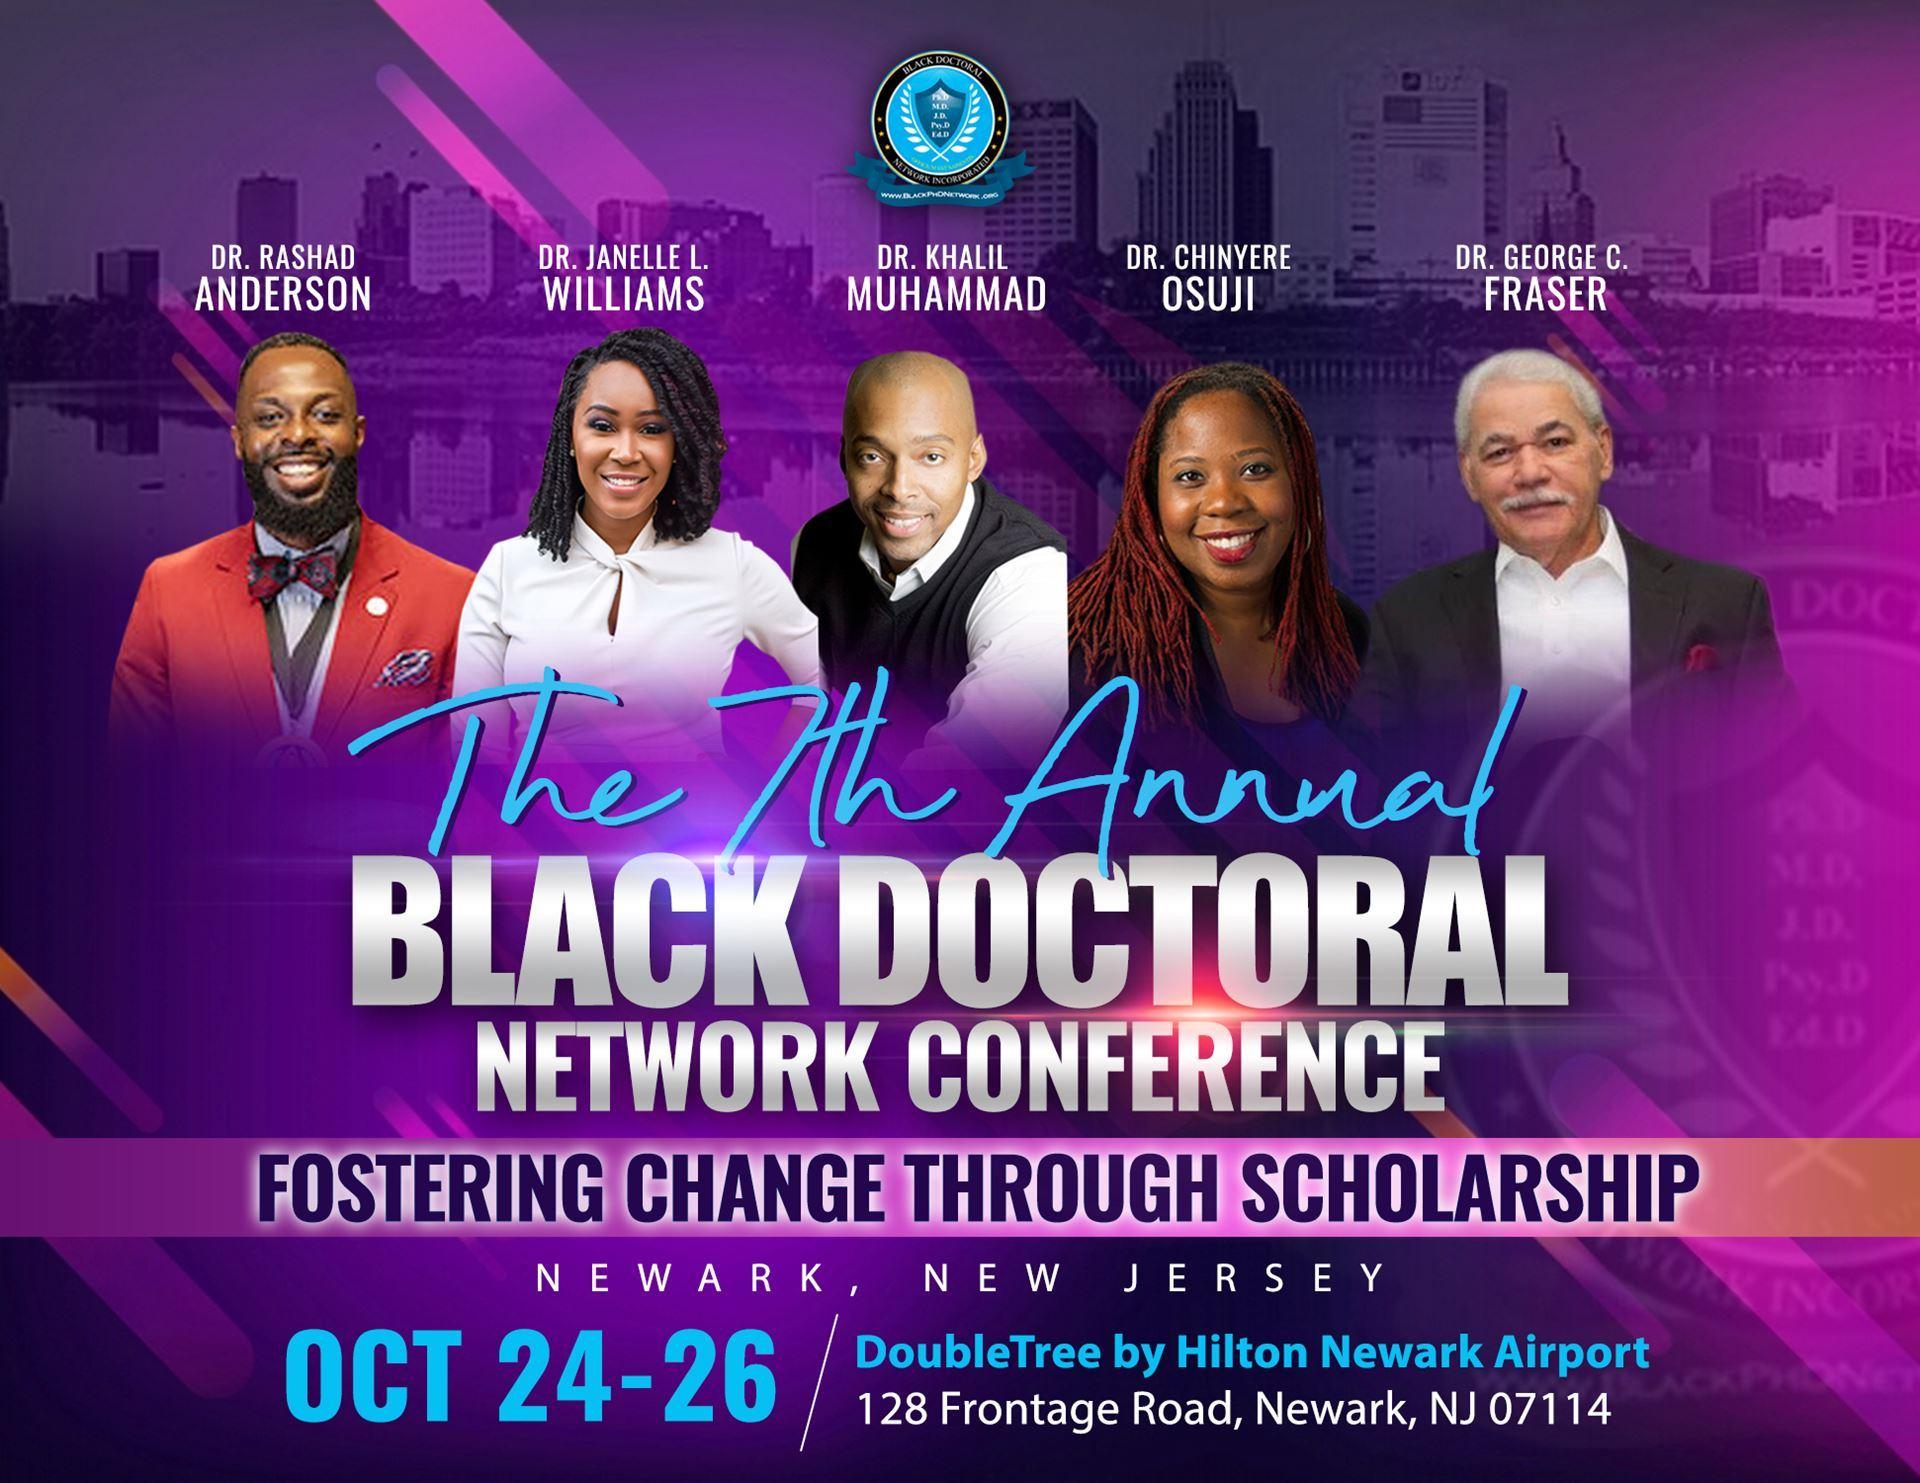 Black Doctoral Network Conference 2019